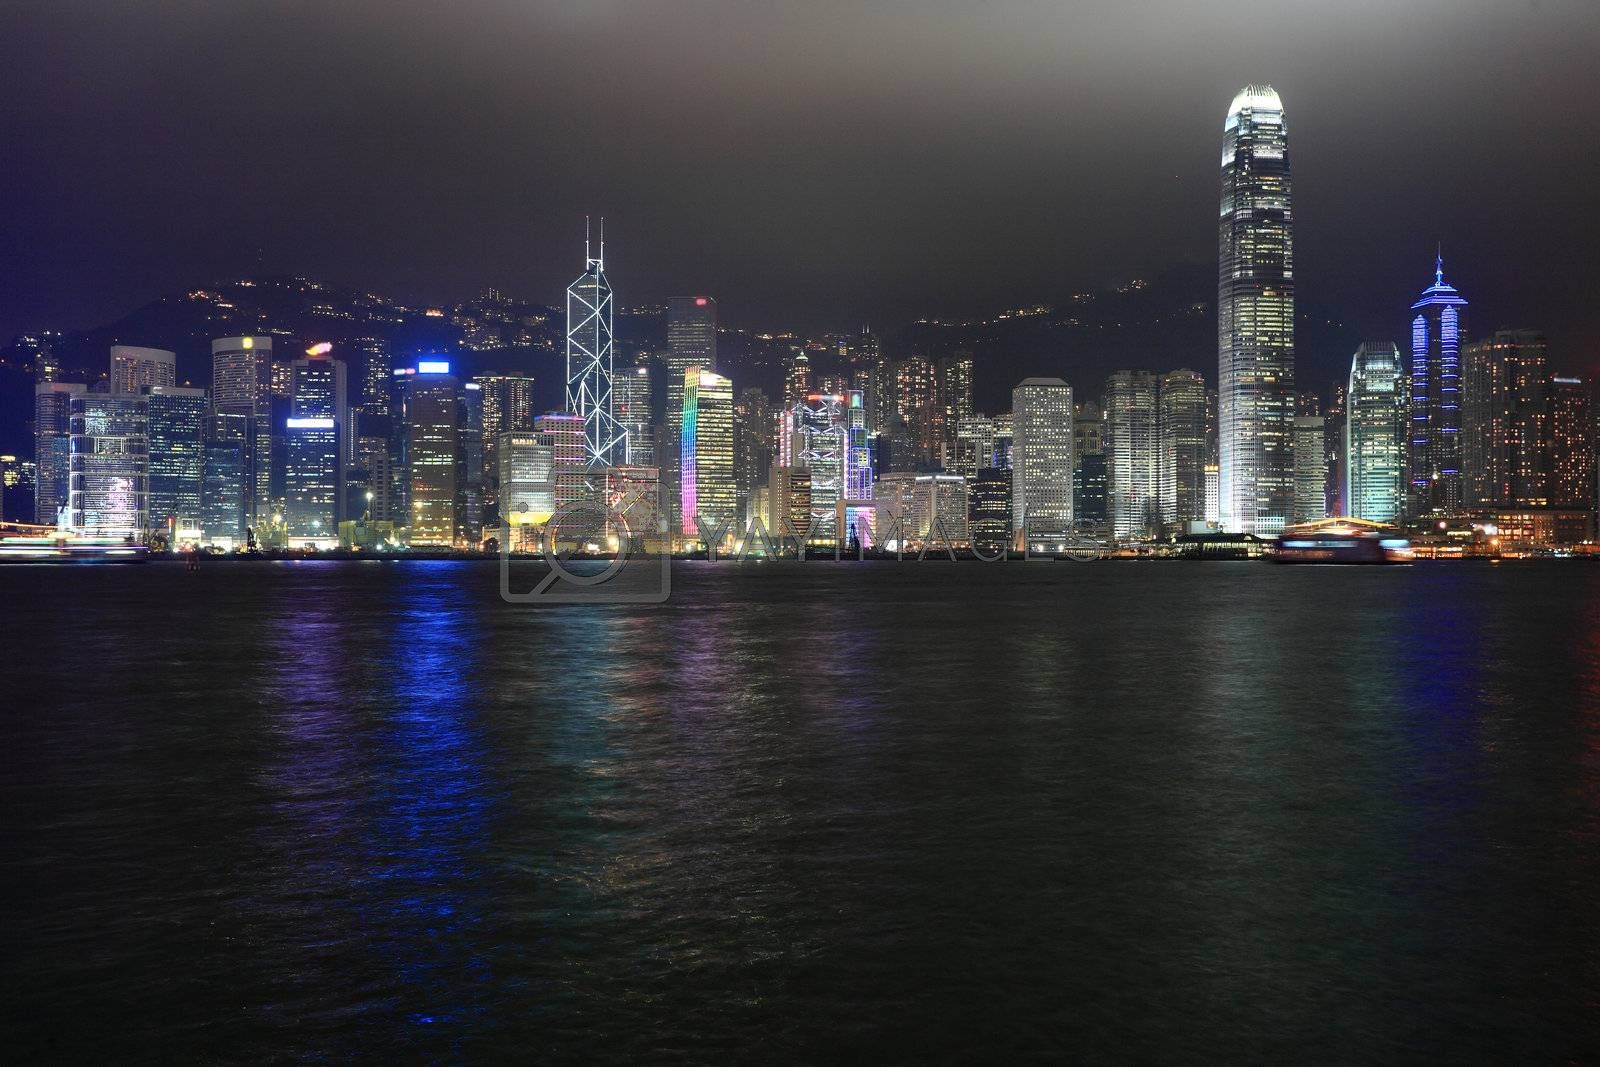 Hong Kong night by leungchopan